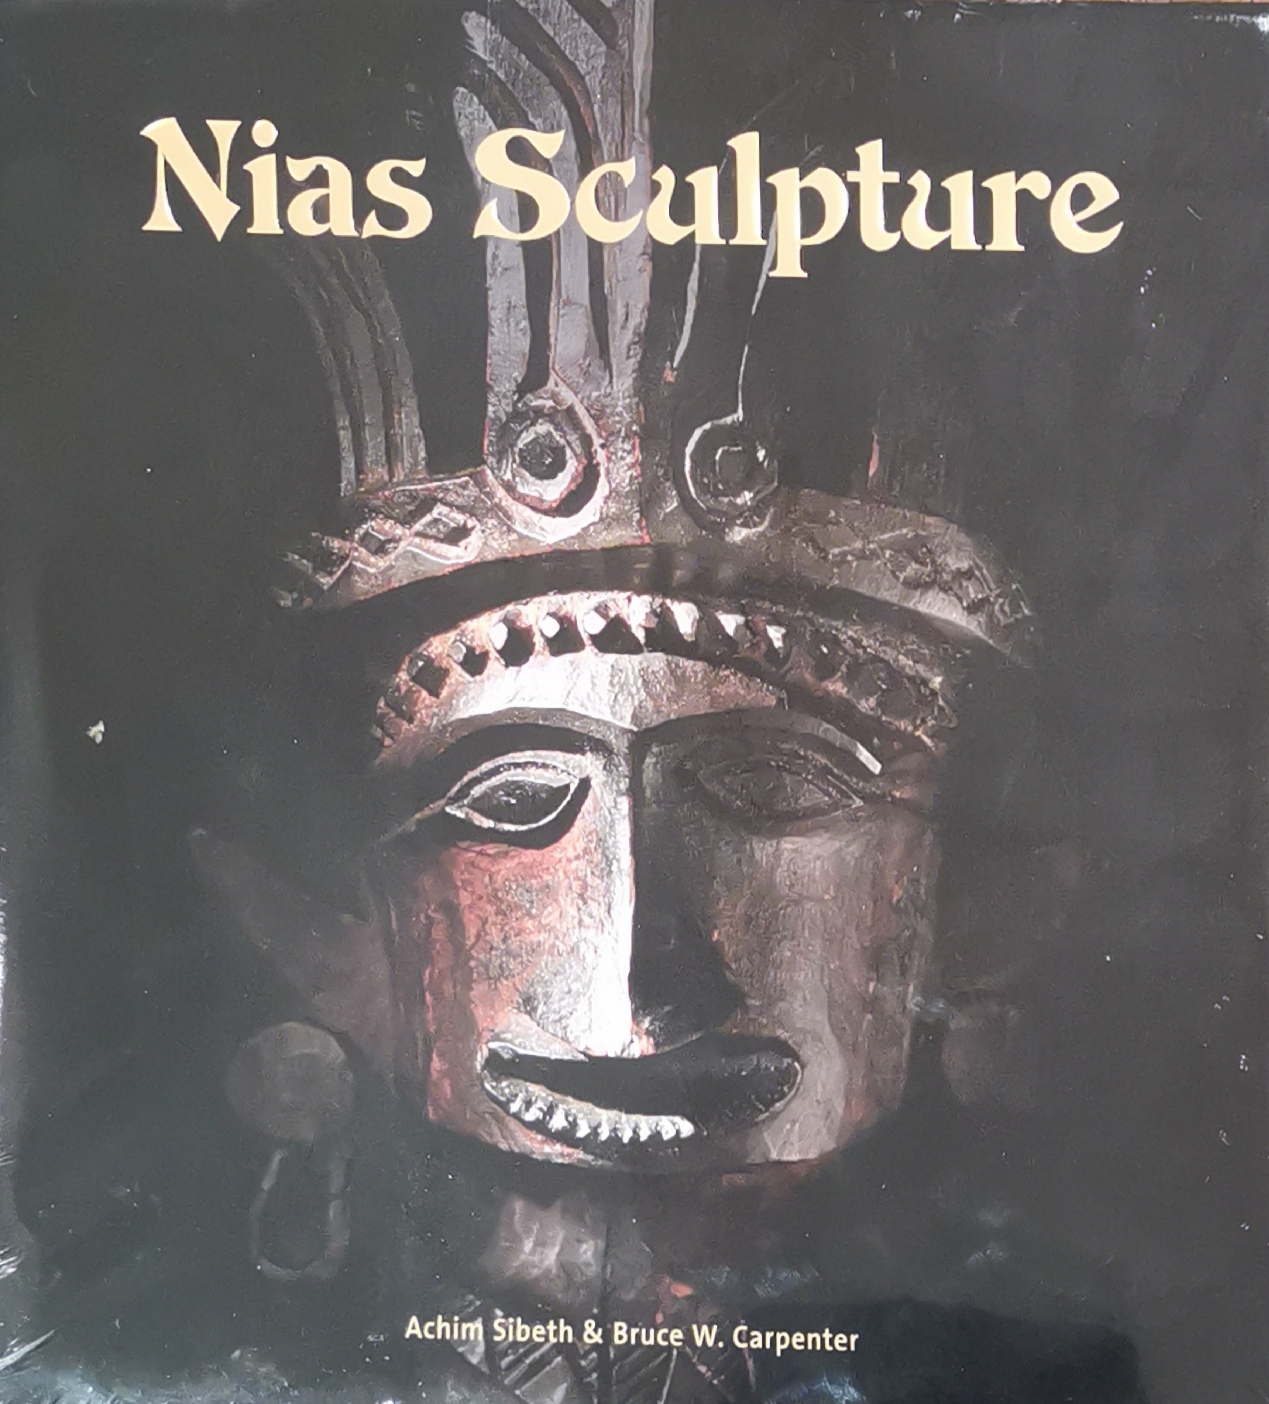 Nias Sculpture